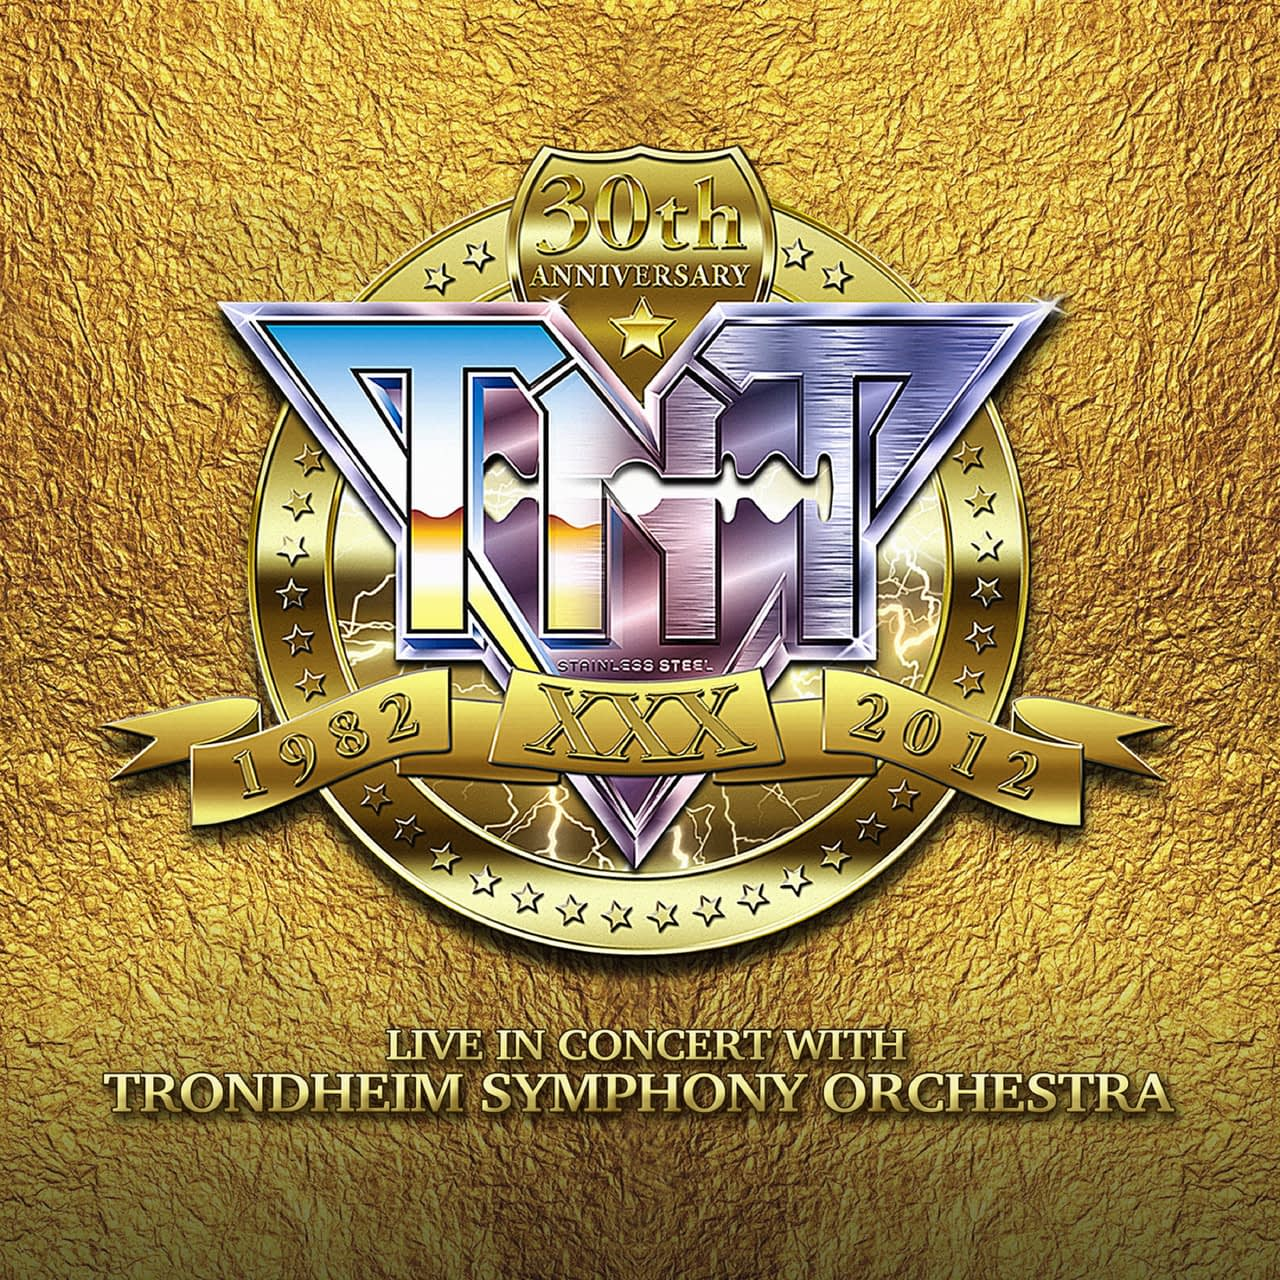 TNT-TRD symf